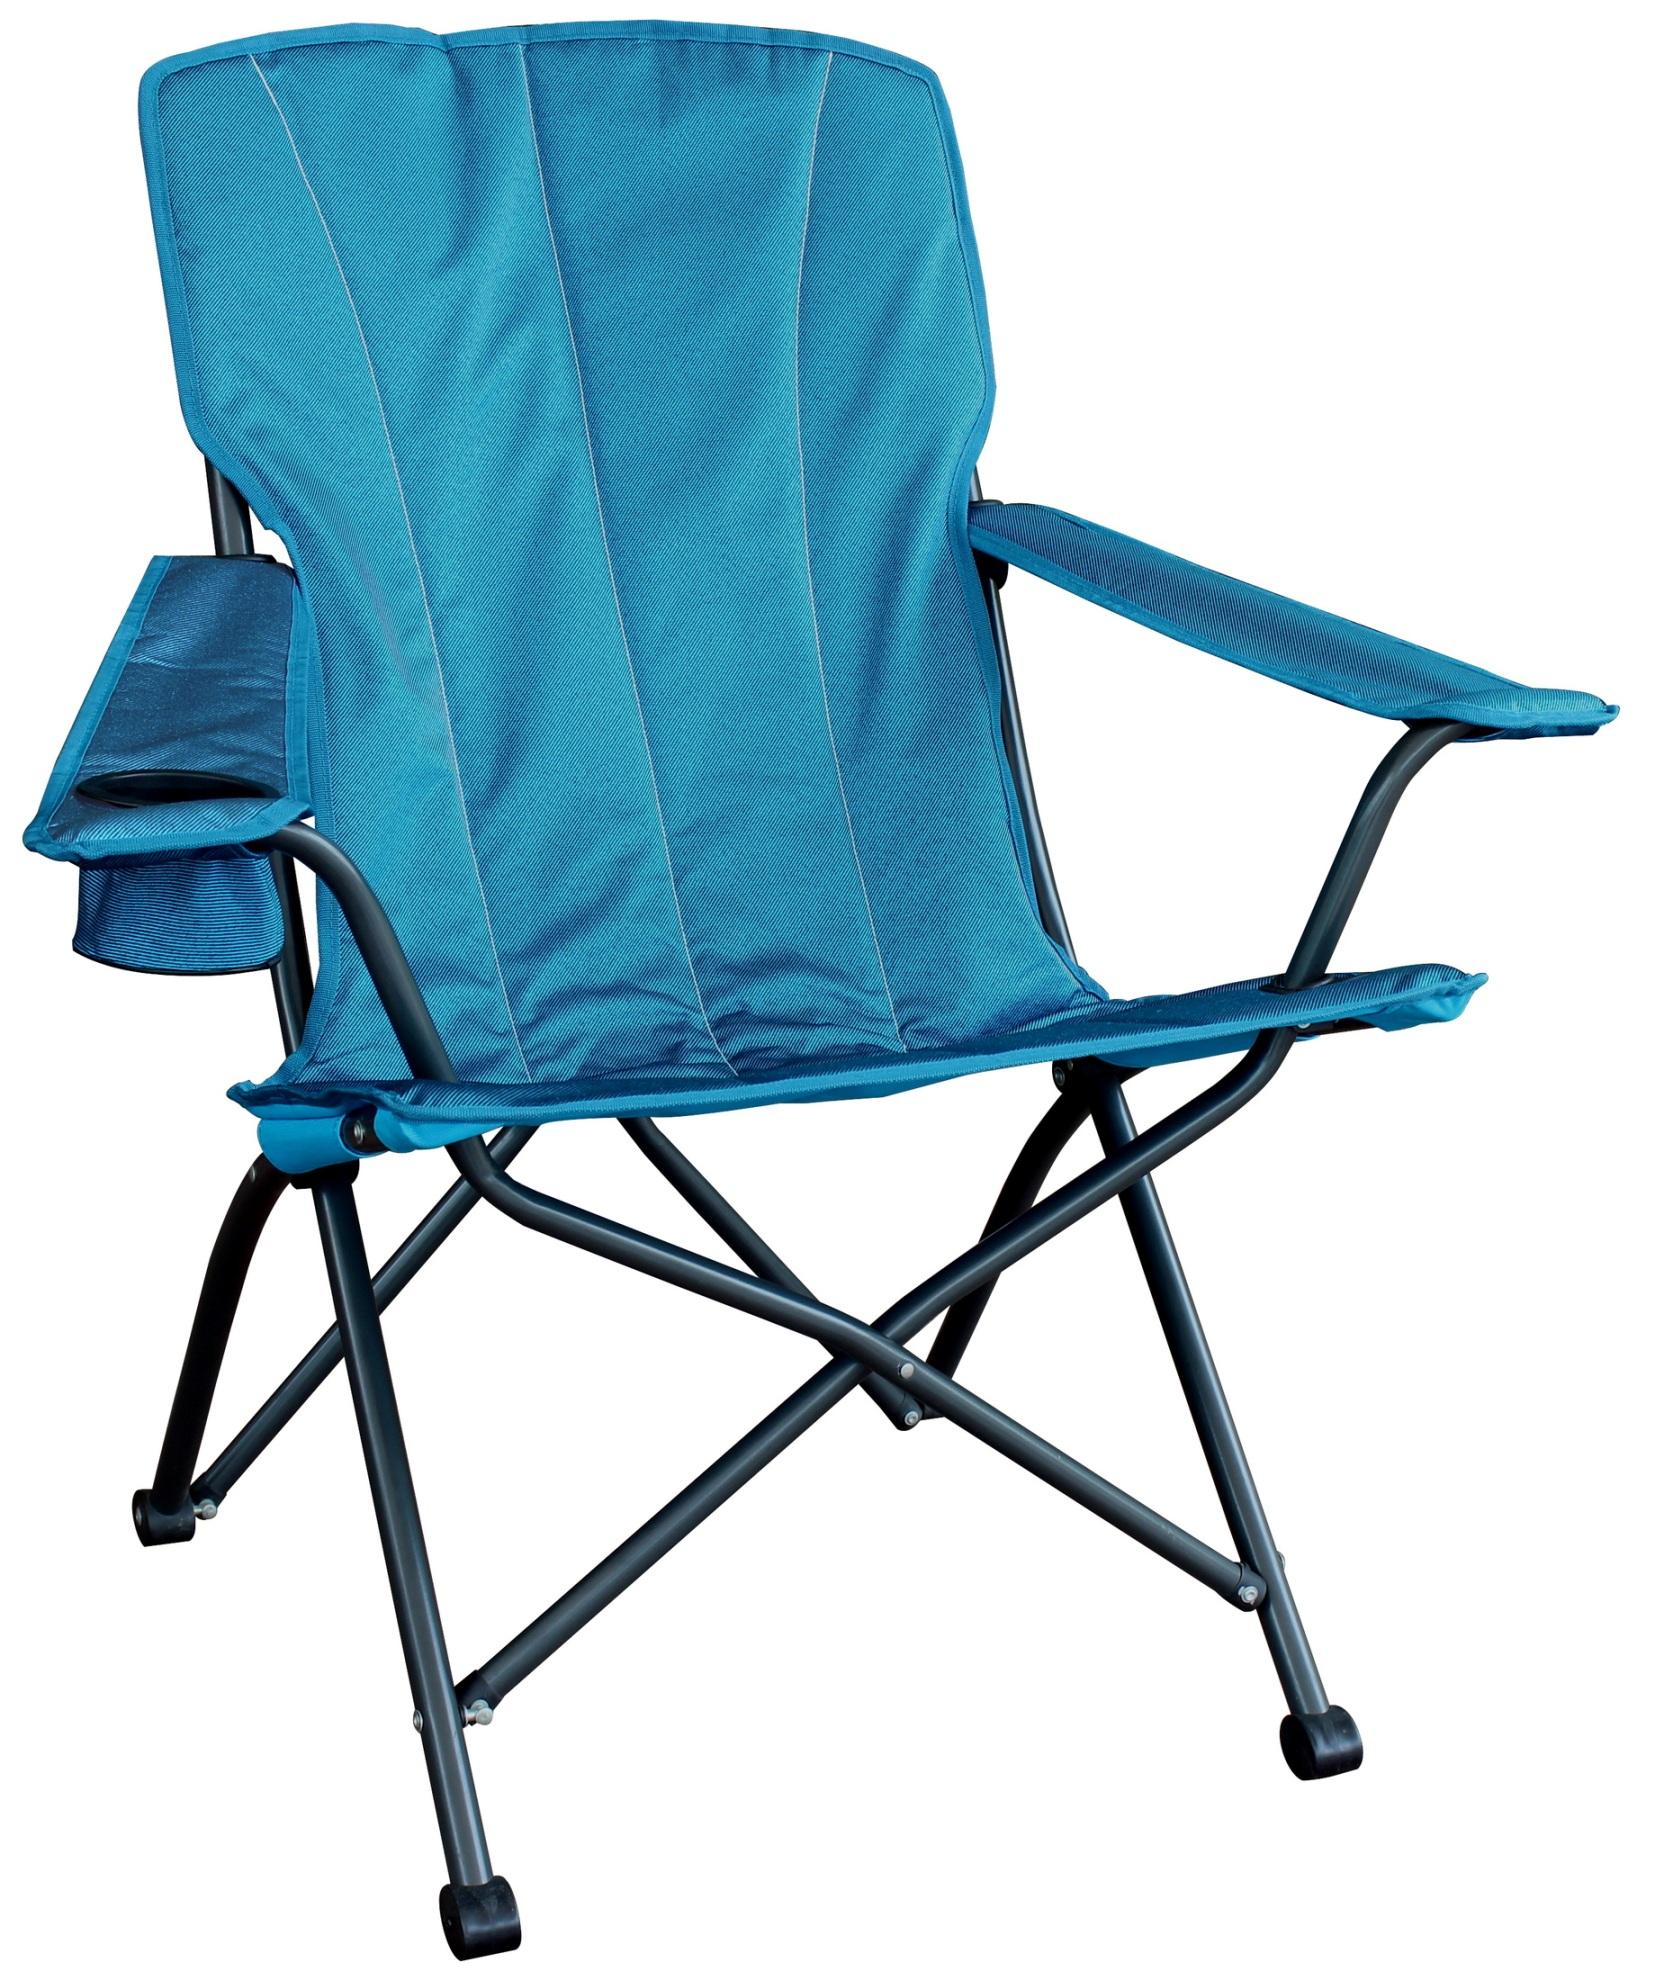 northwest territory chairs target kid adirondack folding chair - blue